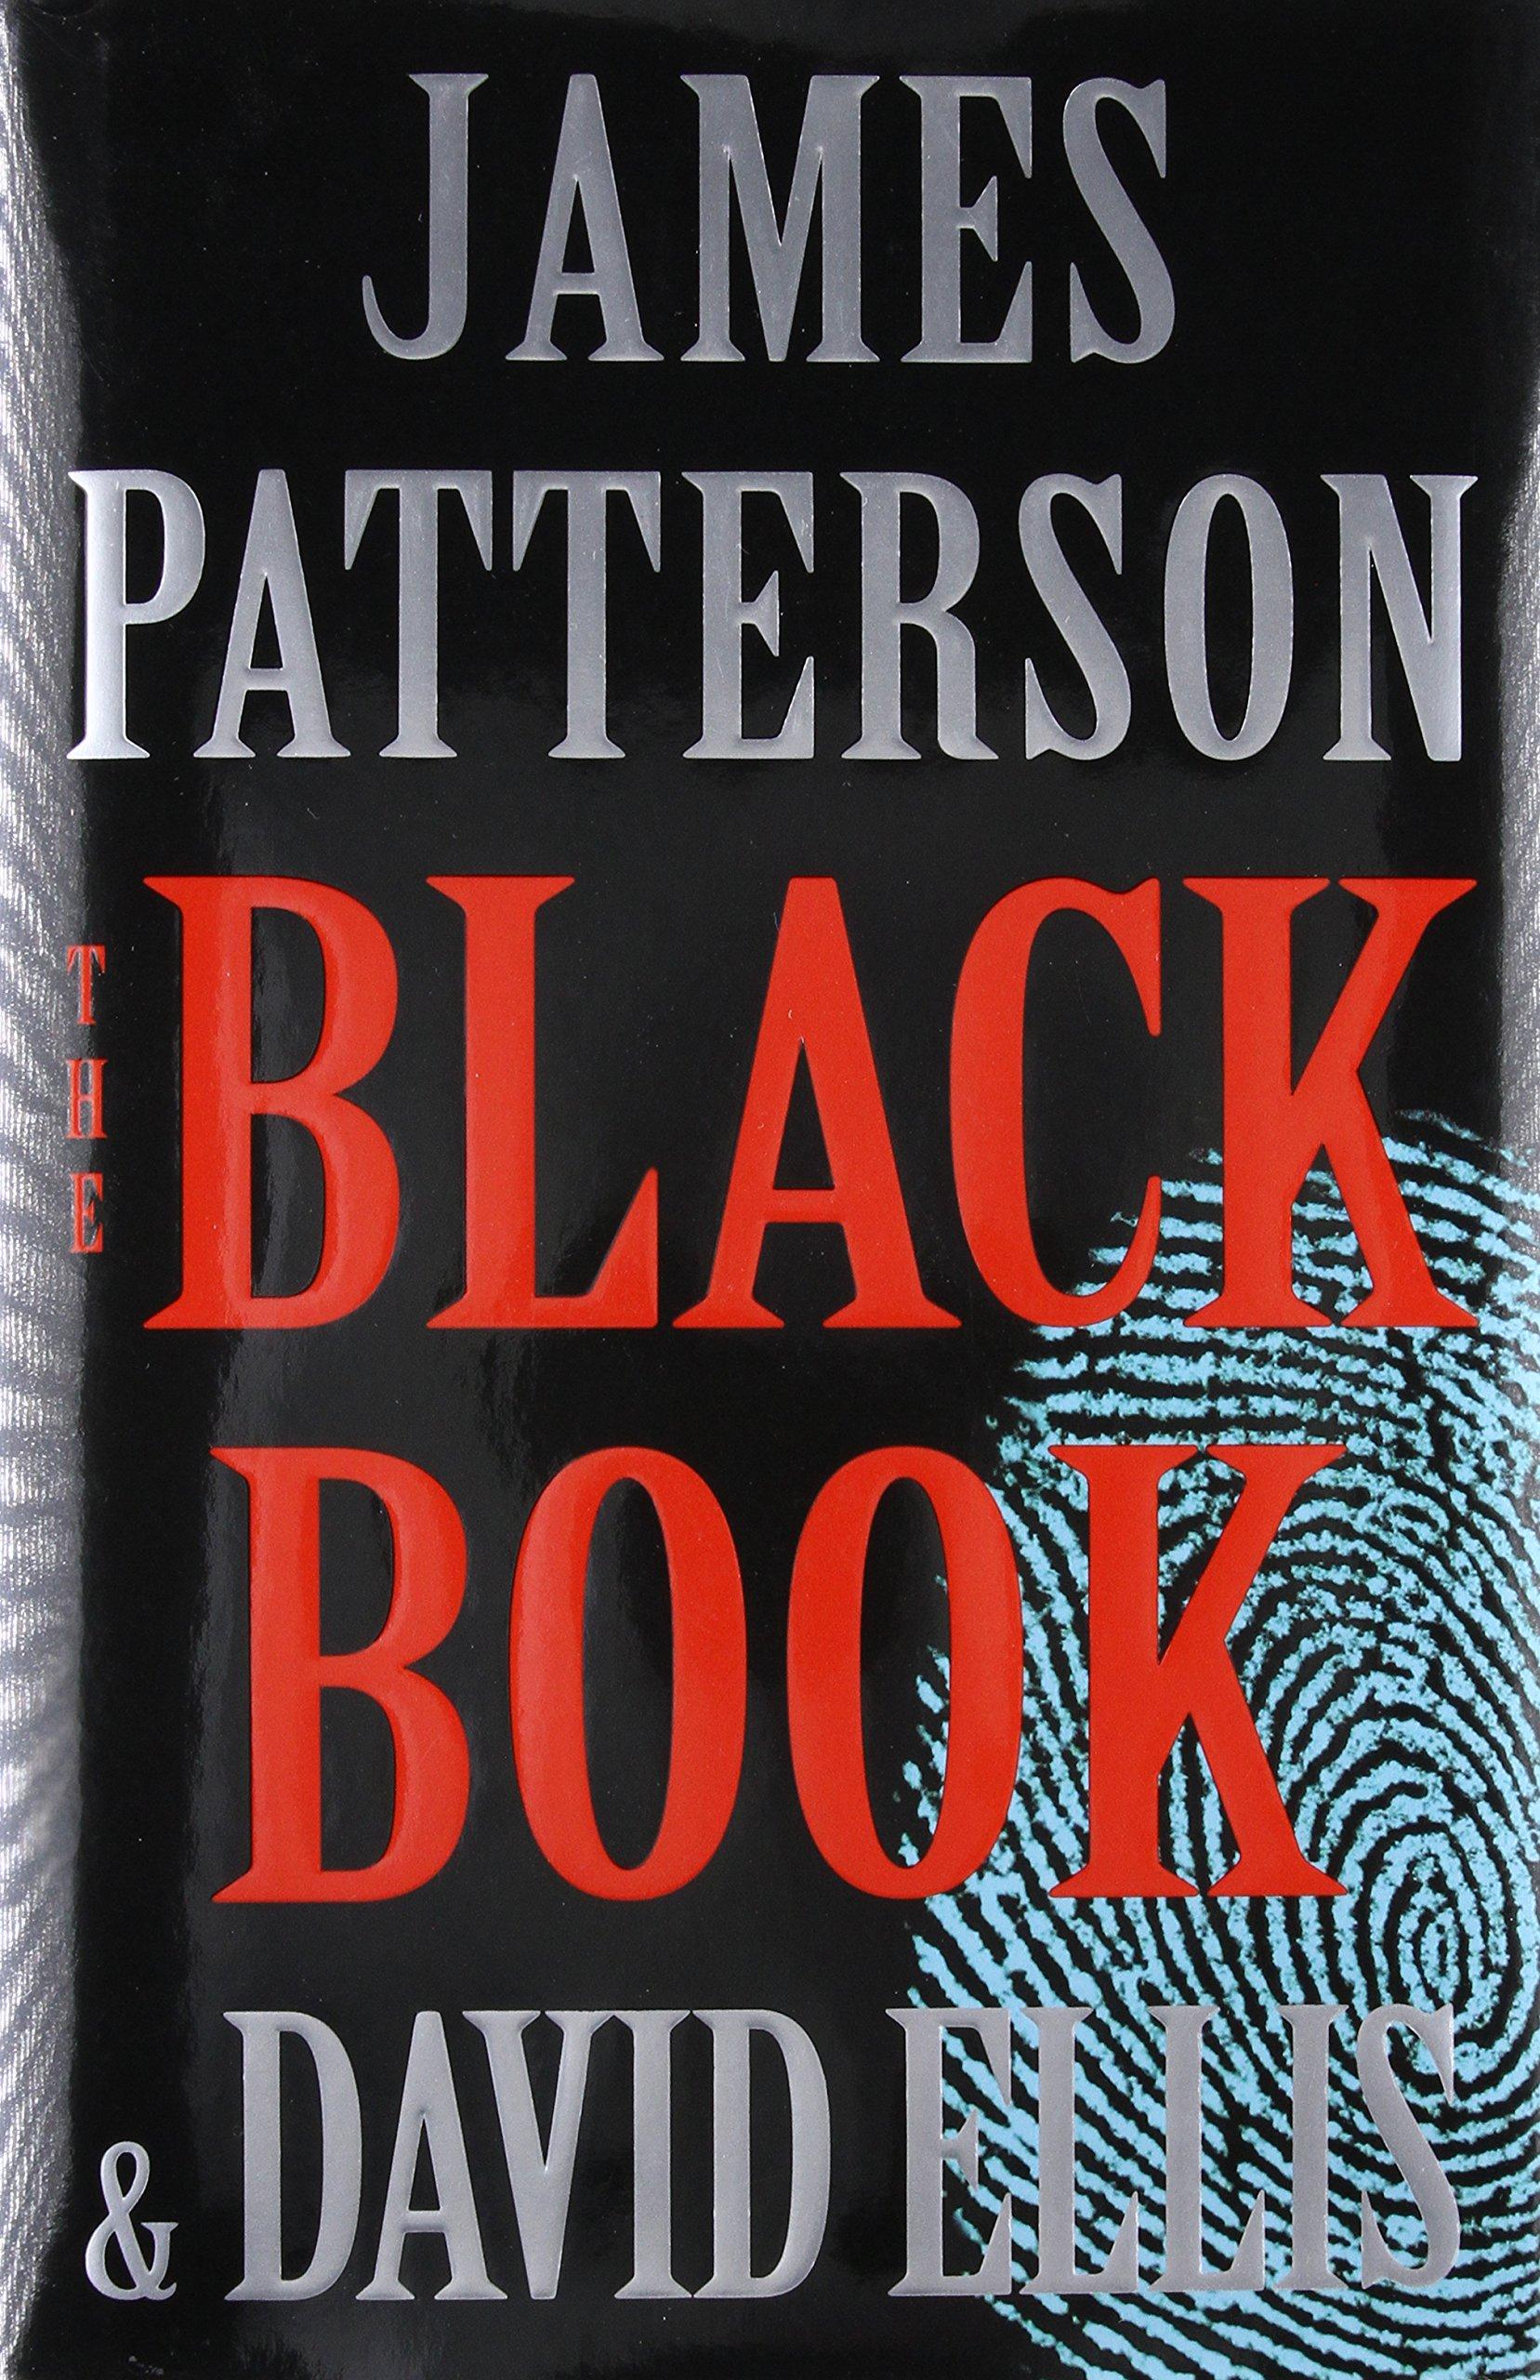 Amazon.com: The Black Book (9780316273886): James Patterson: Books